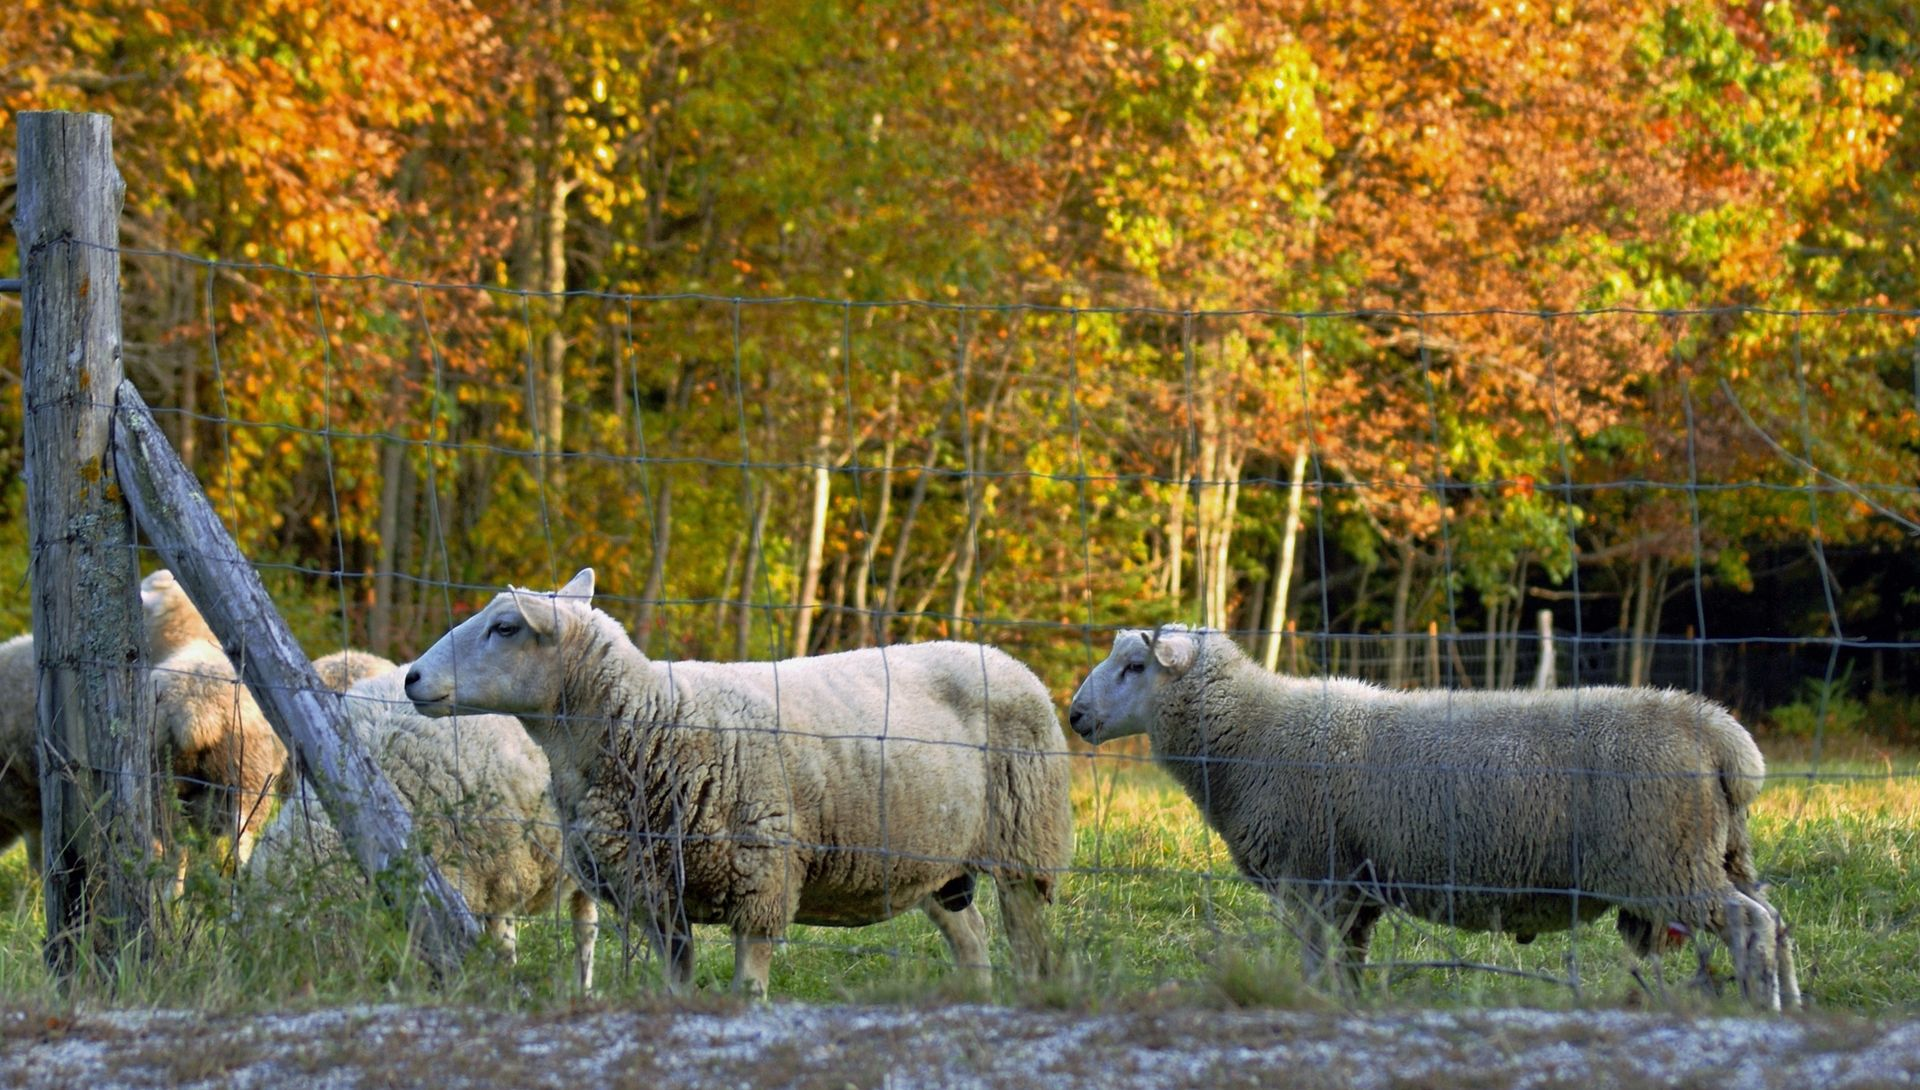 Of Sheep and Shepherds